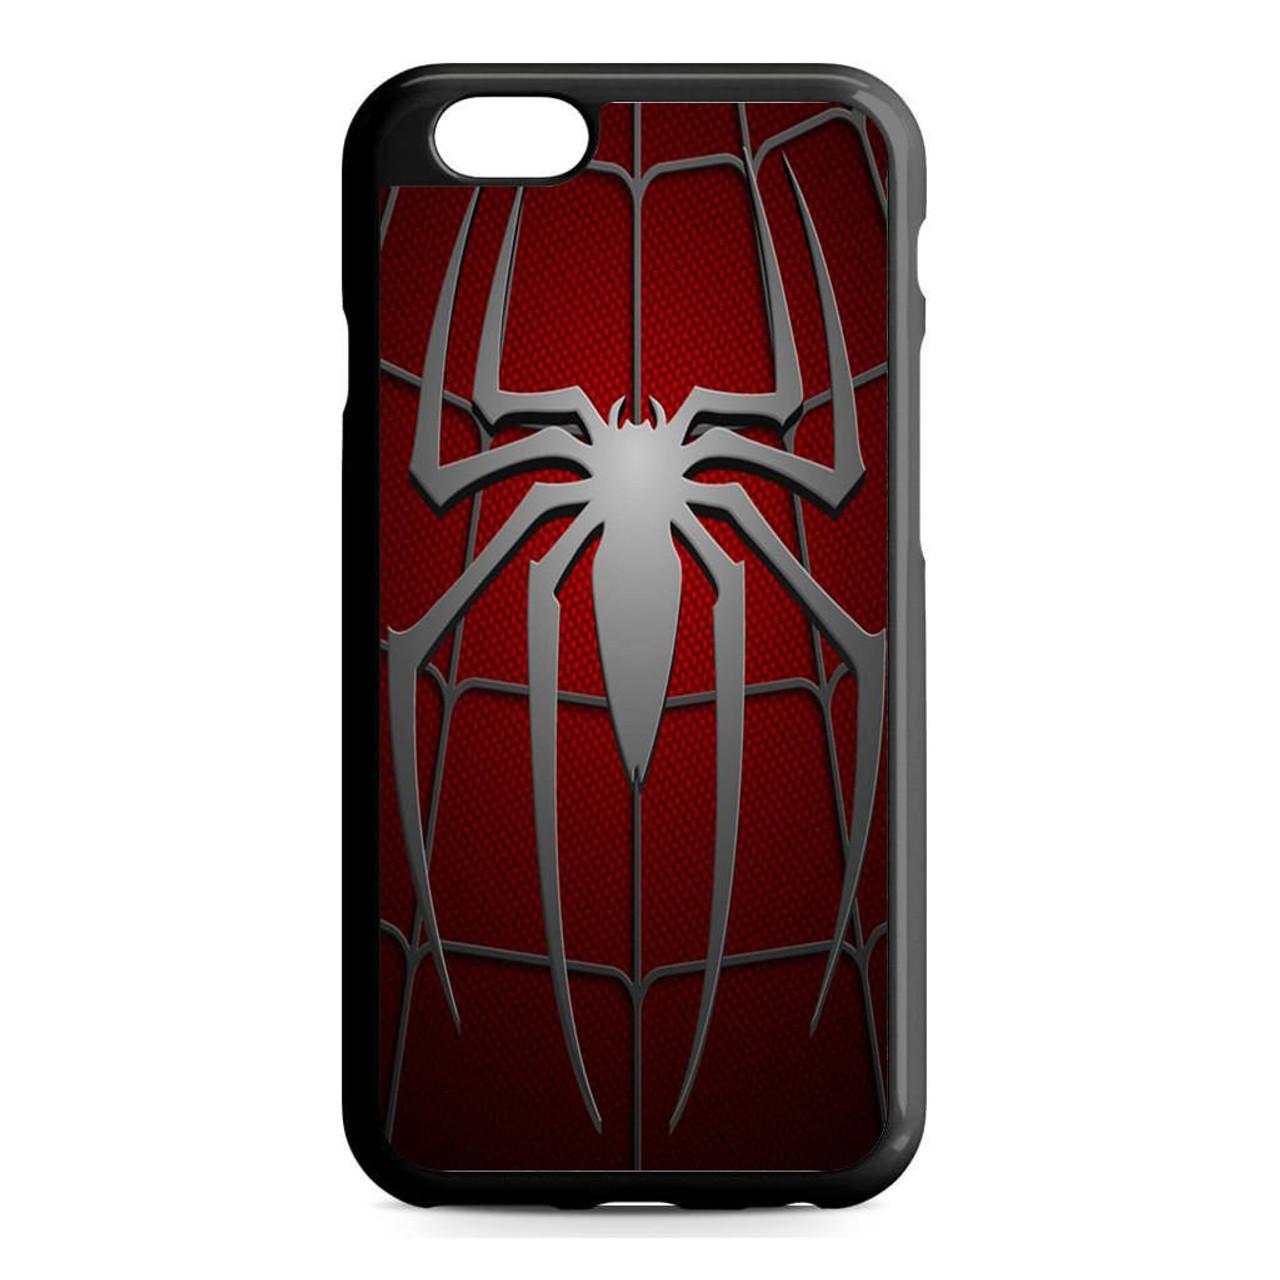 spiderman cases iphone 6